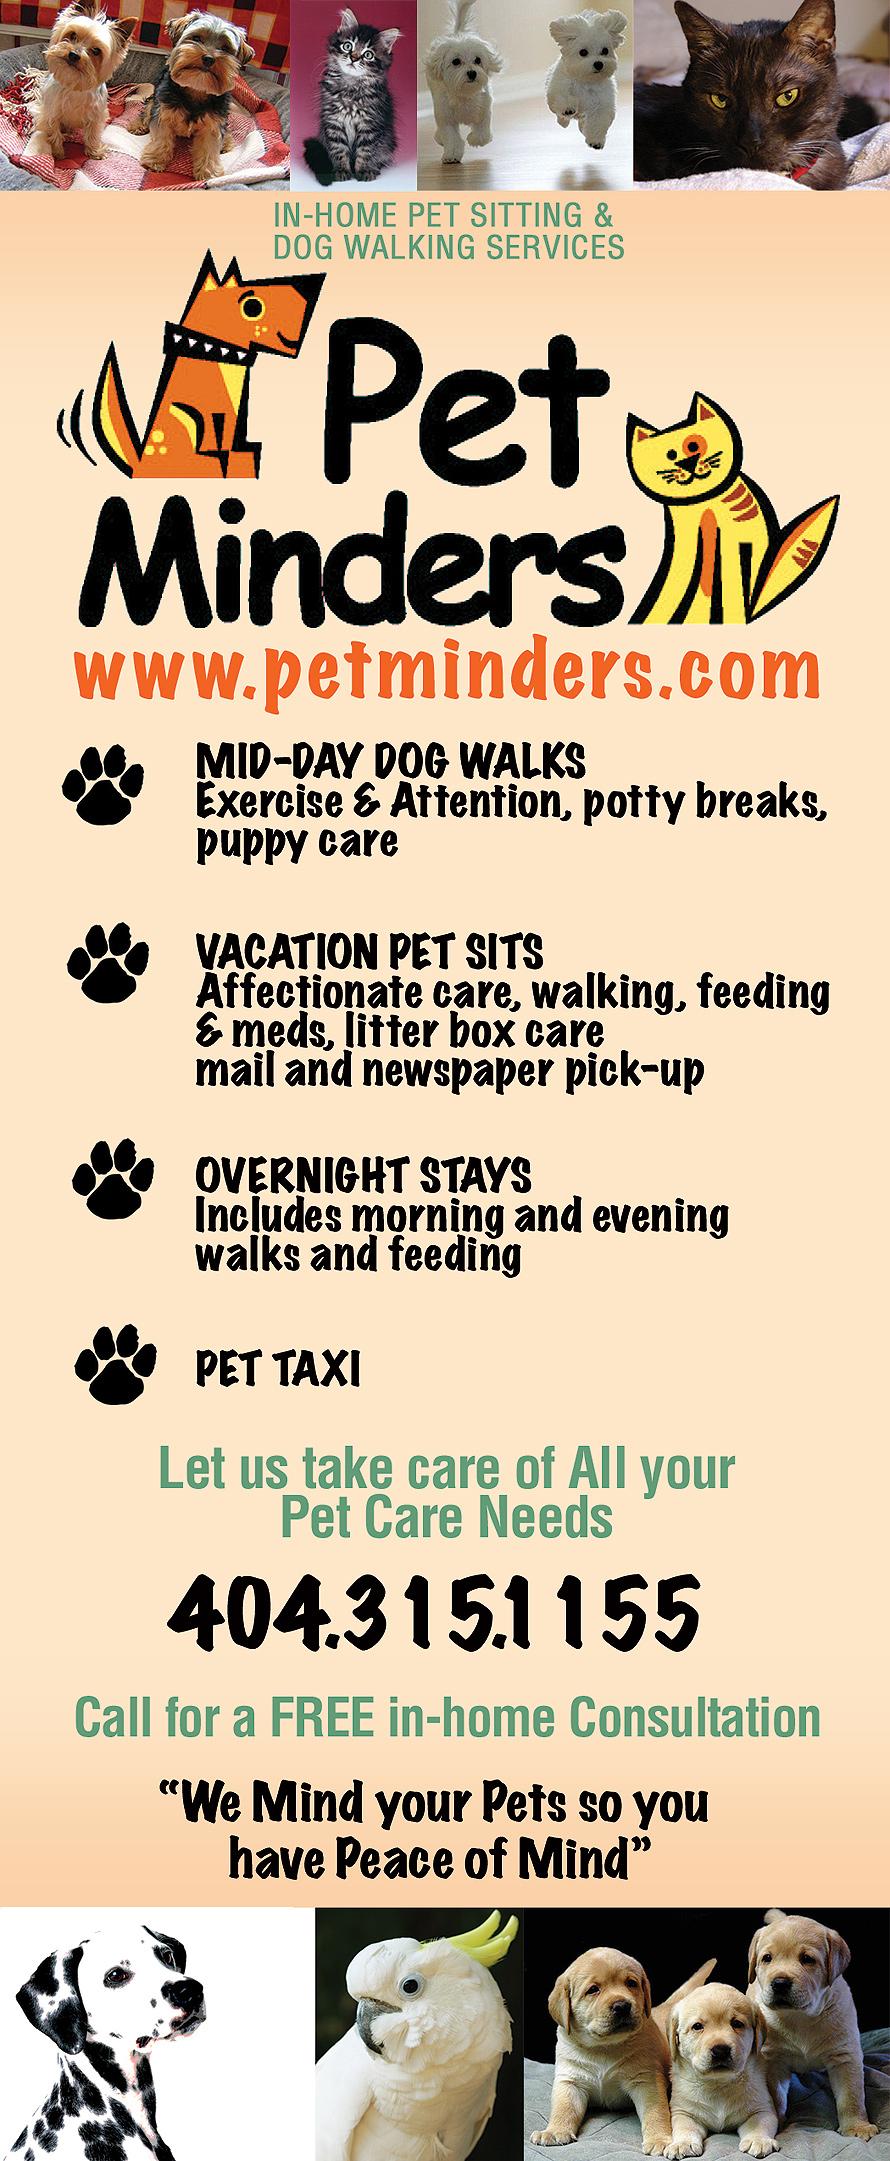 Pet Minders